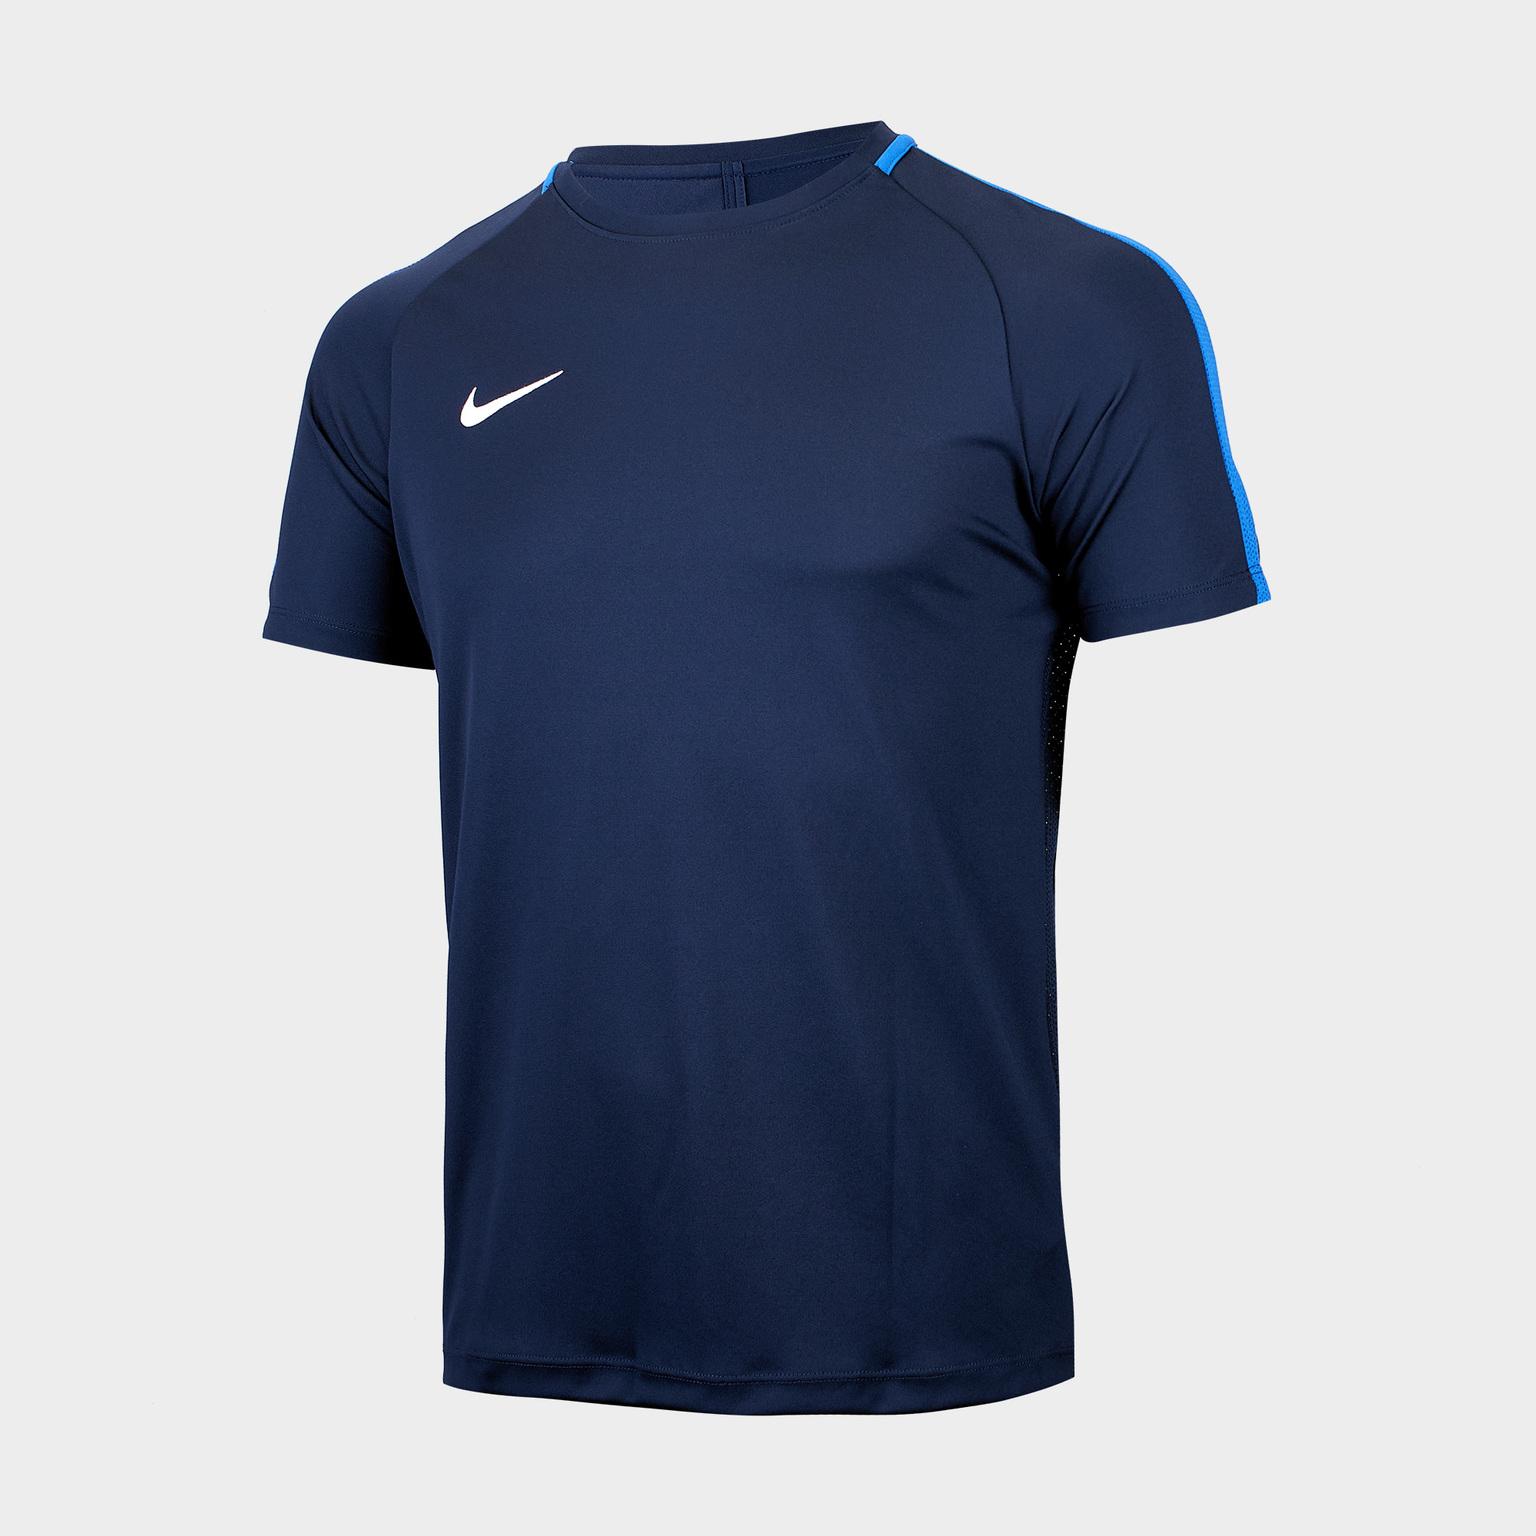 Футболка тренировочная Nike Academy18 Top JR 893750-451 детские бутсы nike бутсы nike jr phantom 3 elite df fg ah7292 081